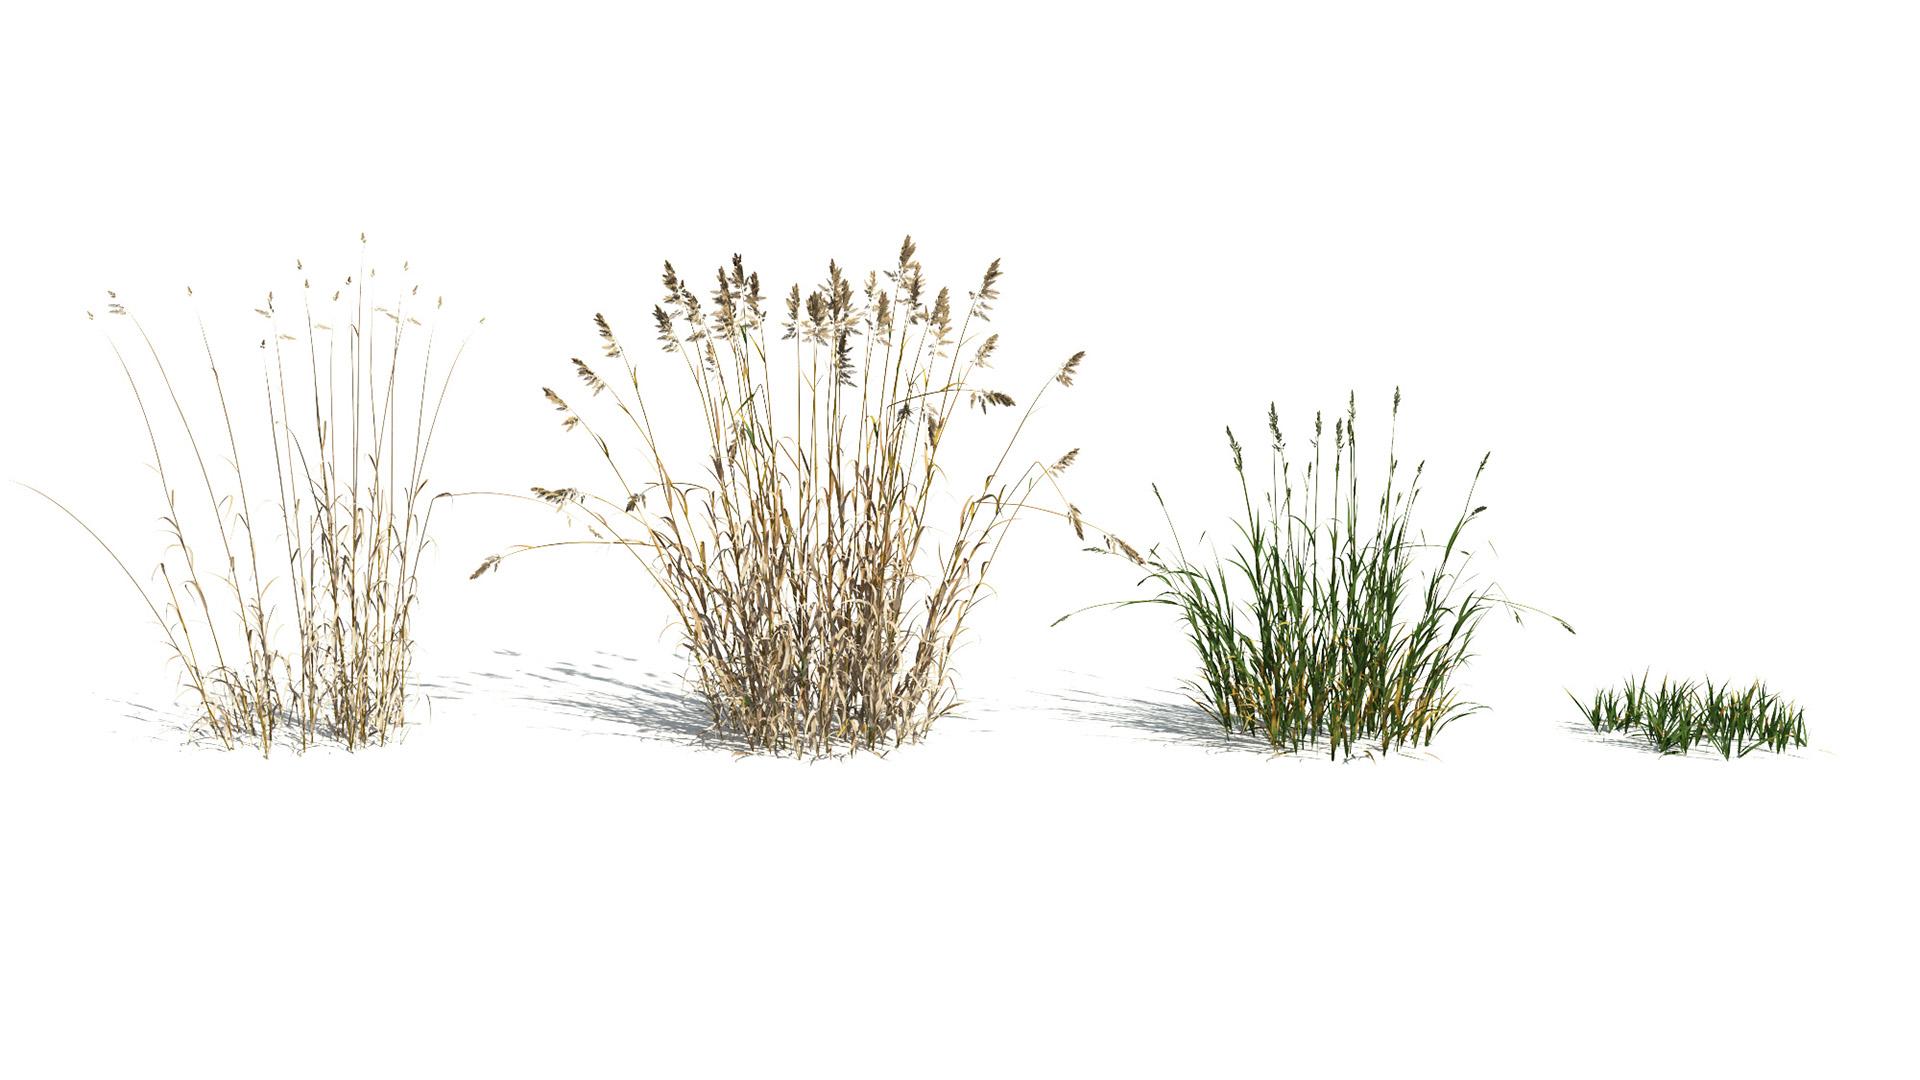 3D model of the Reed canary grass Phalaris arundinacea season variations